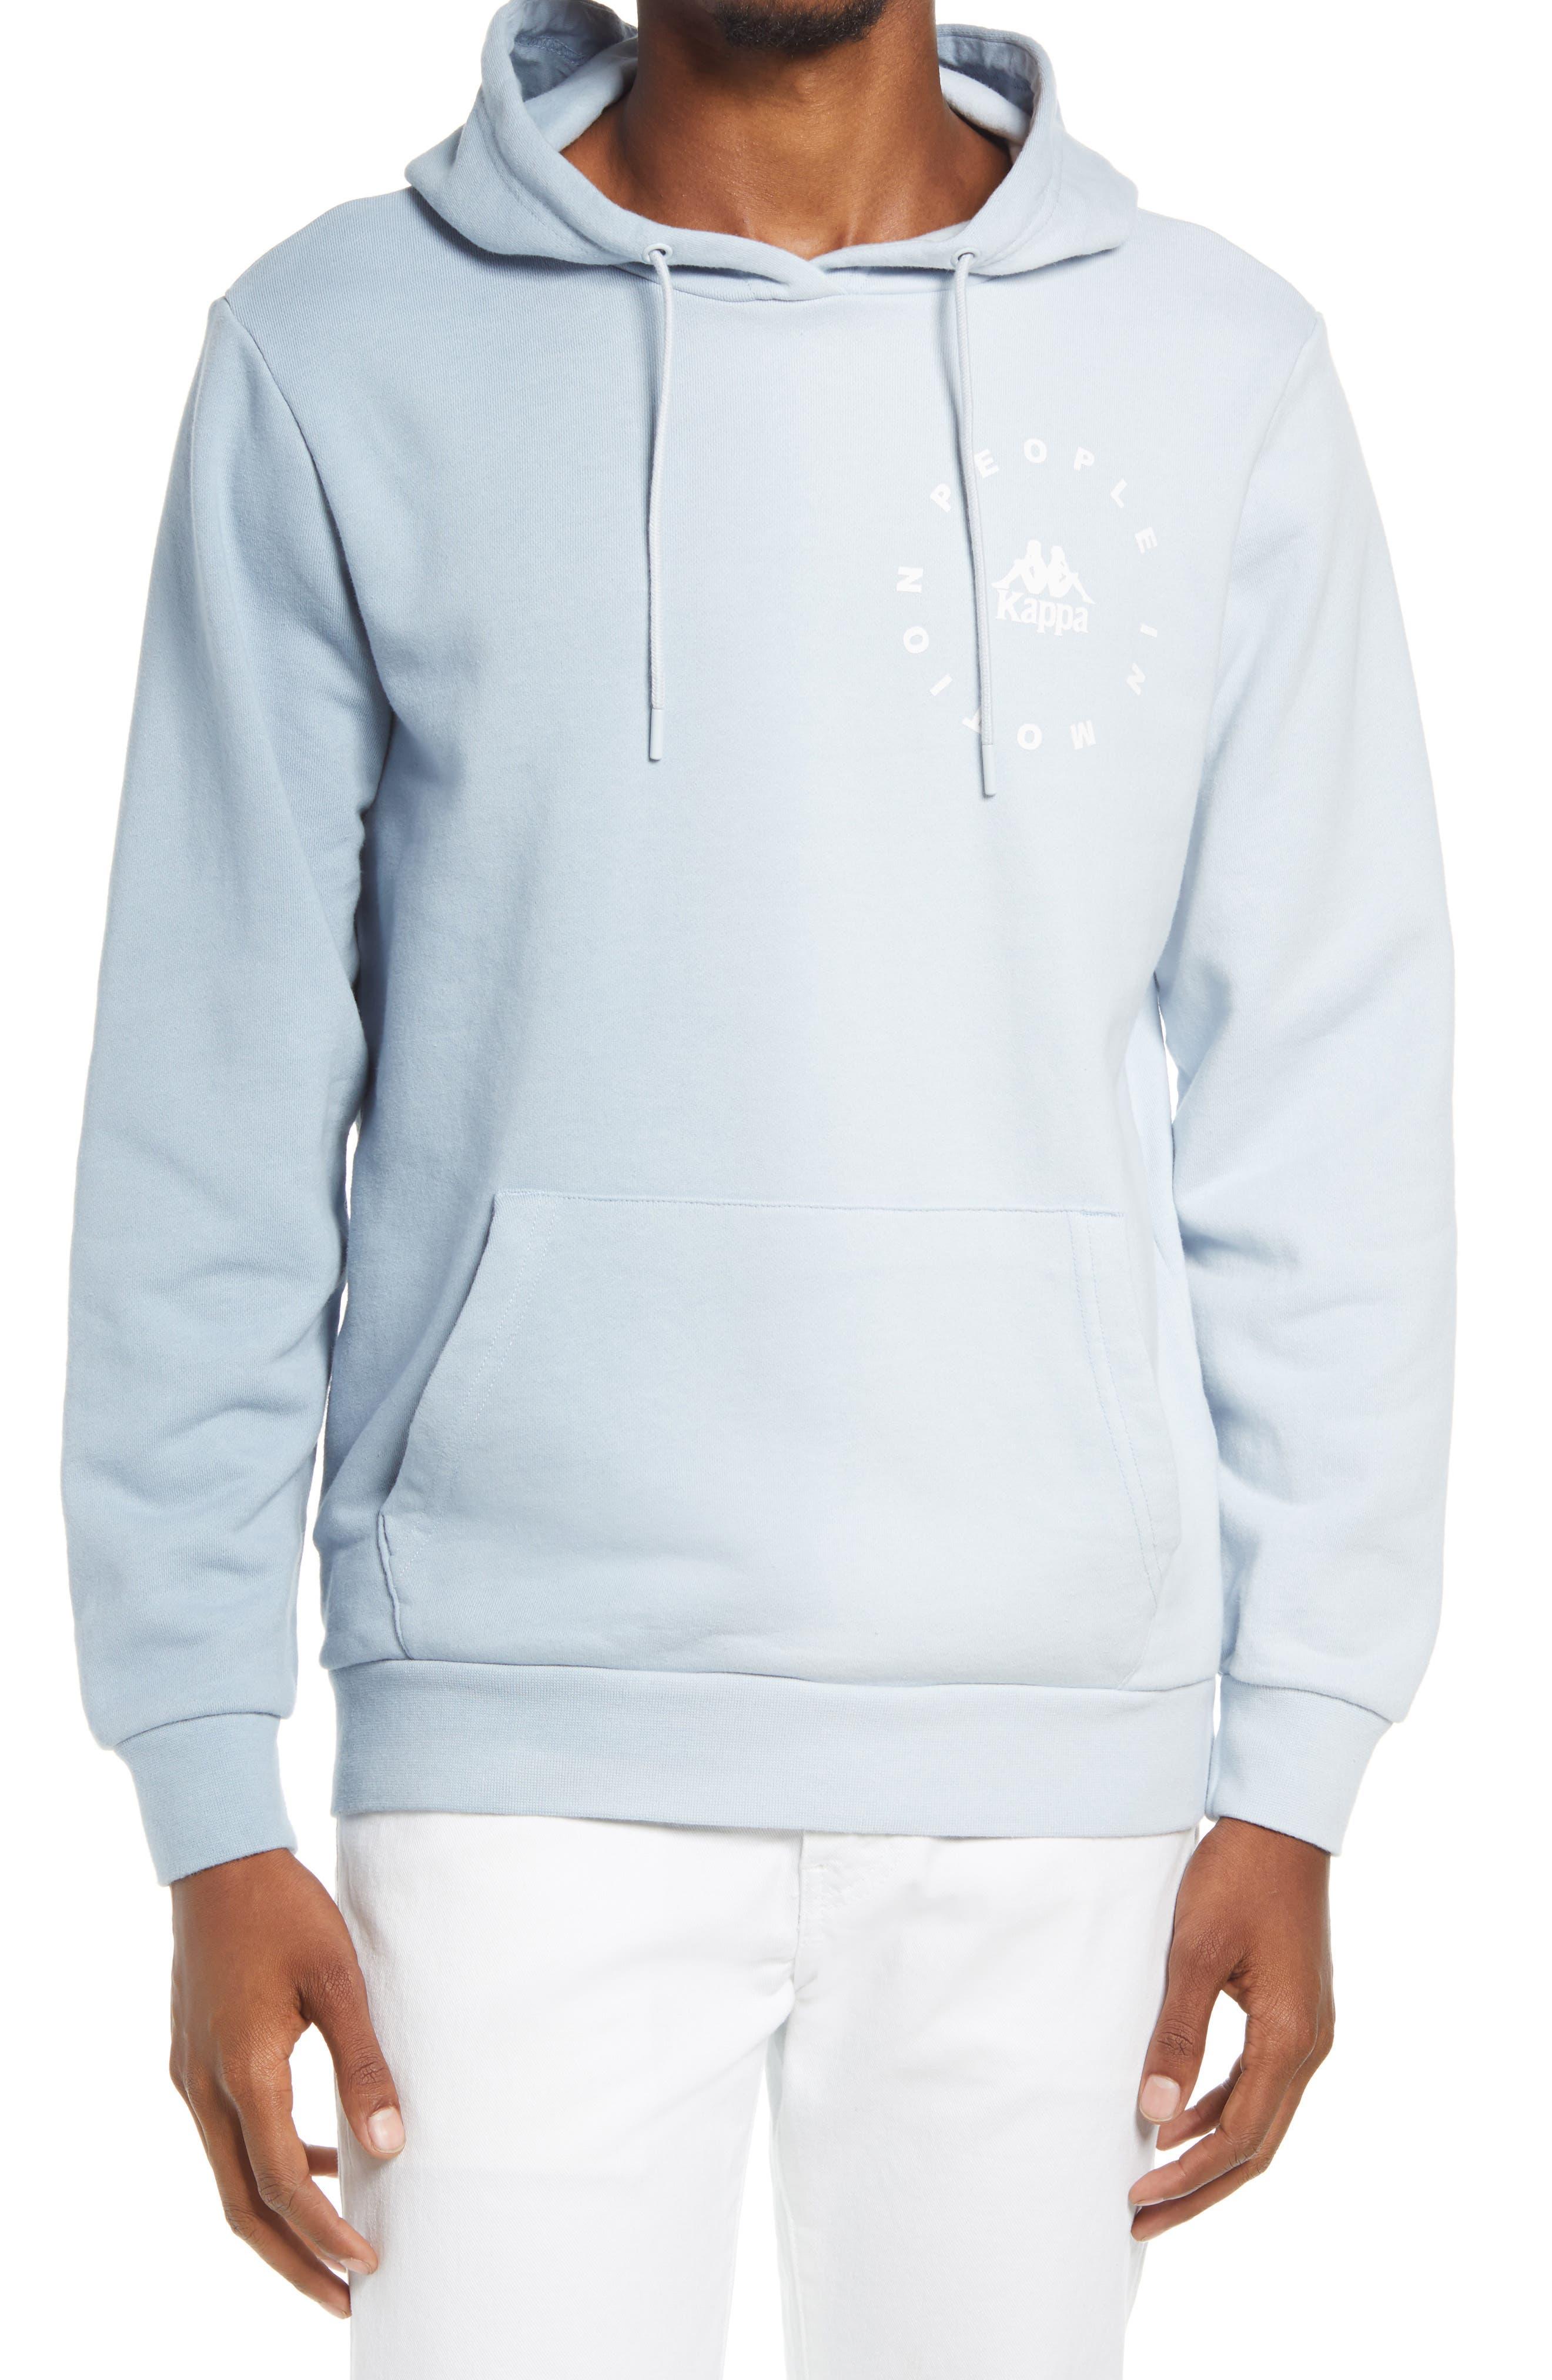 Authentic Diptado Dip Dye Logo Hooded Sweatshirt